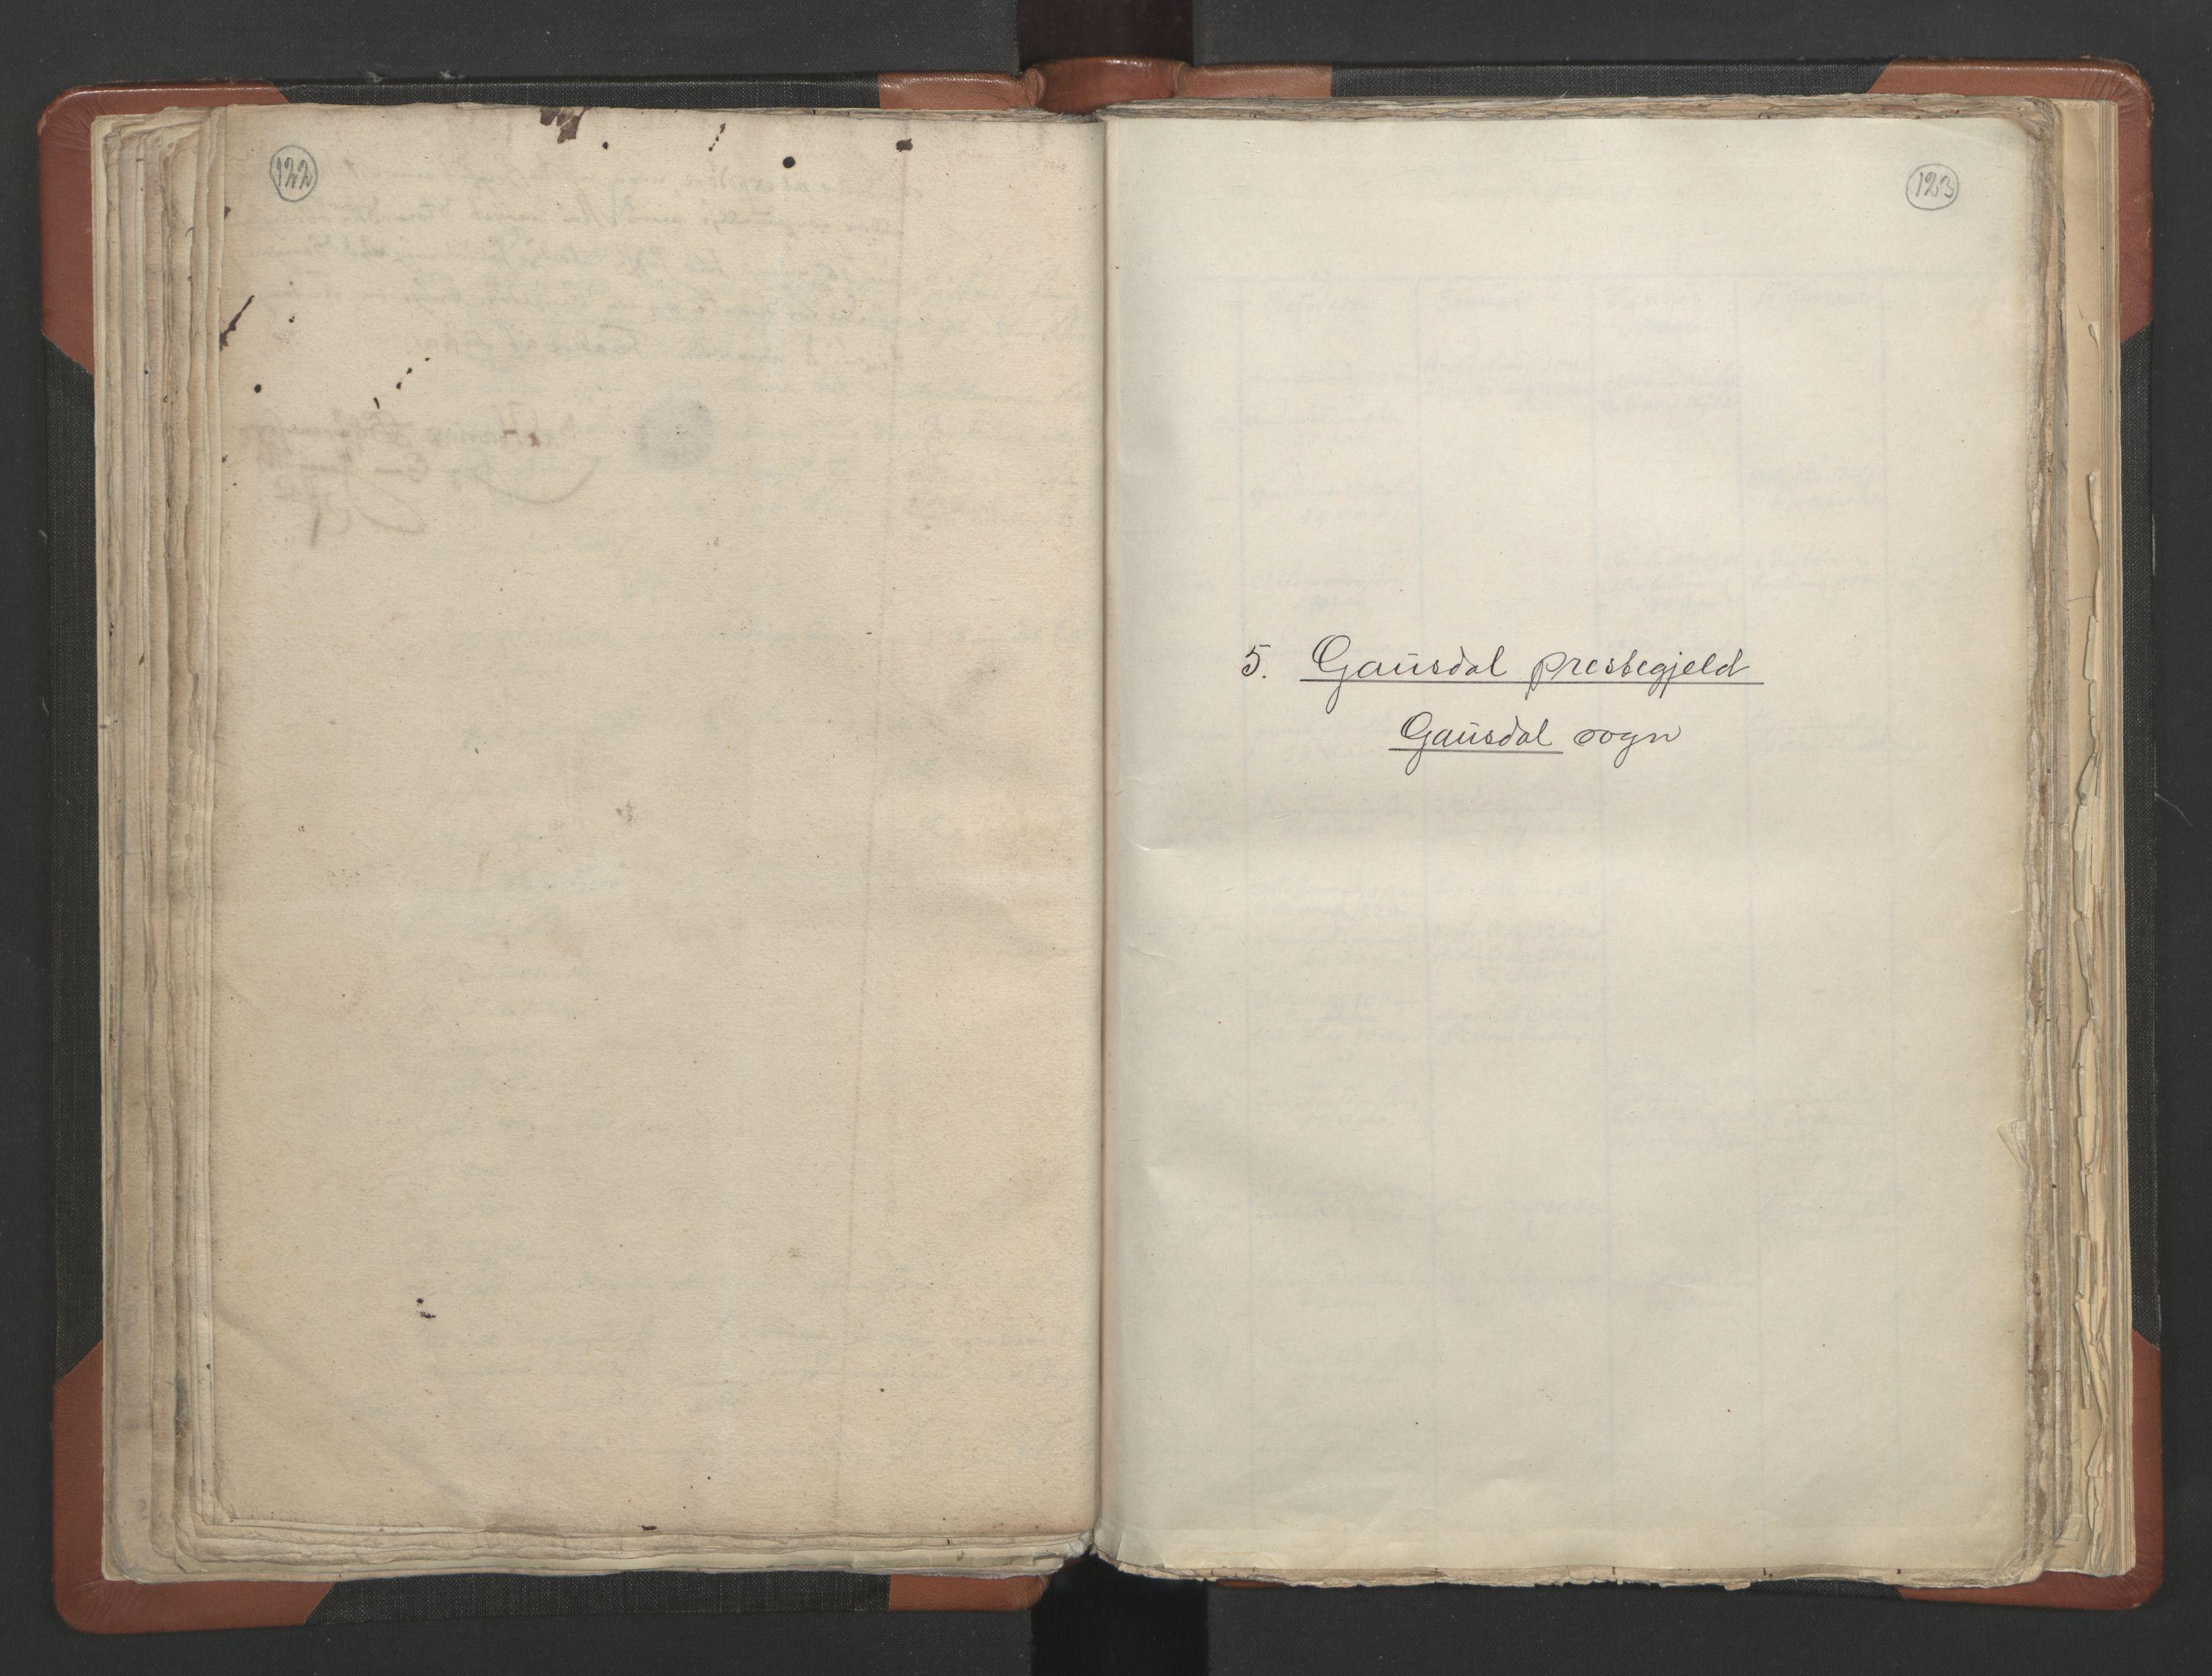 RA, Vicar's Census 1664-1666, no. 6: Gudbrandsdal deanery, 1664-1666, p. 122-123